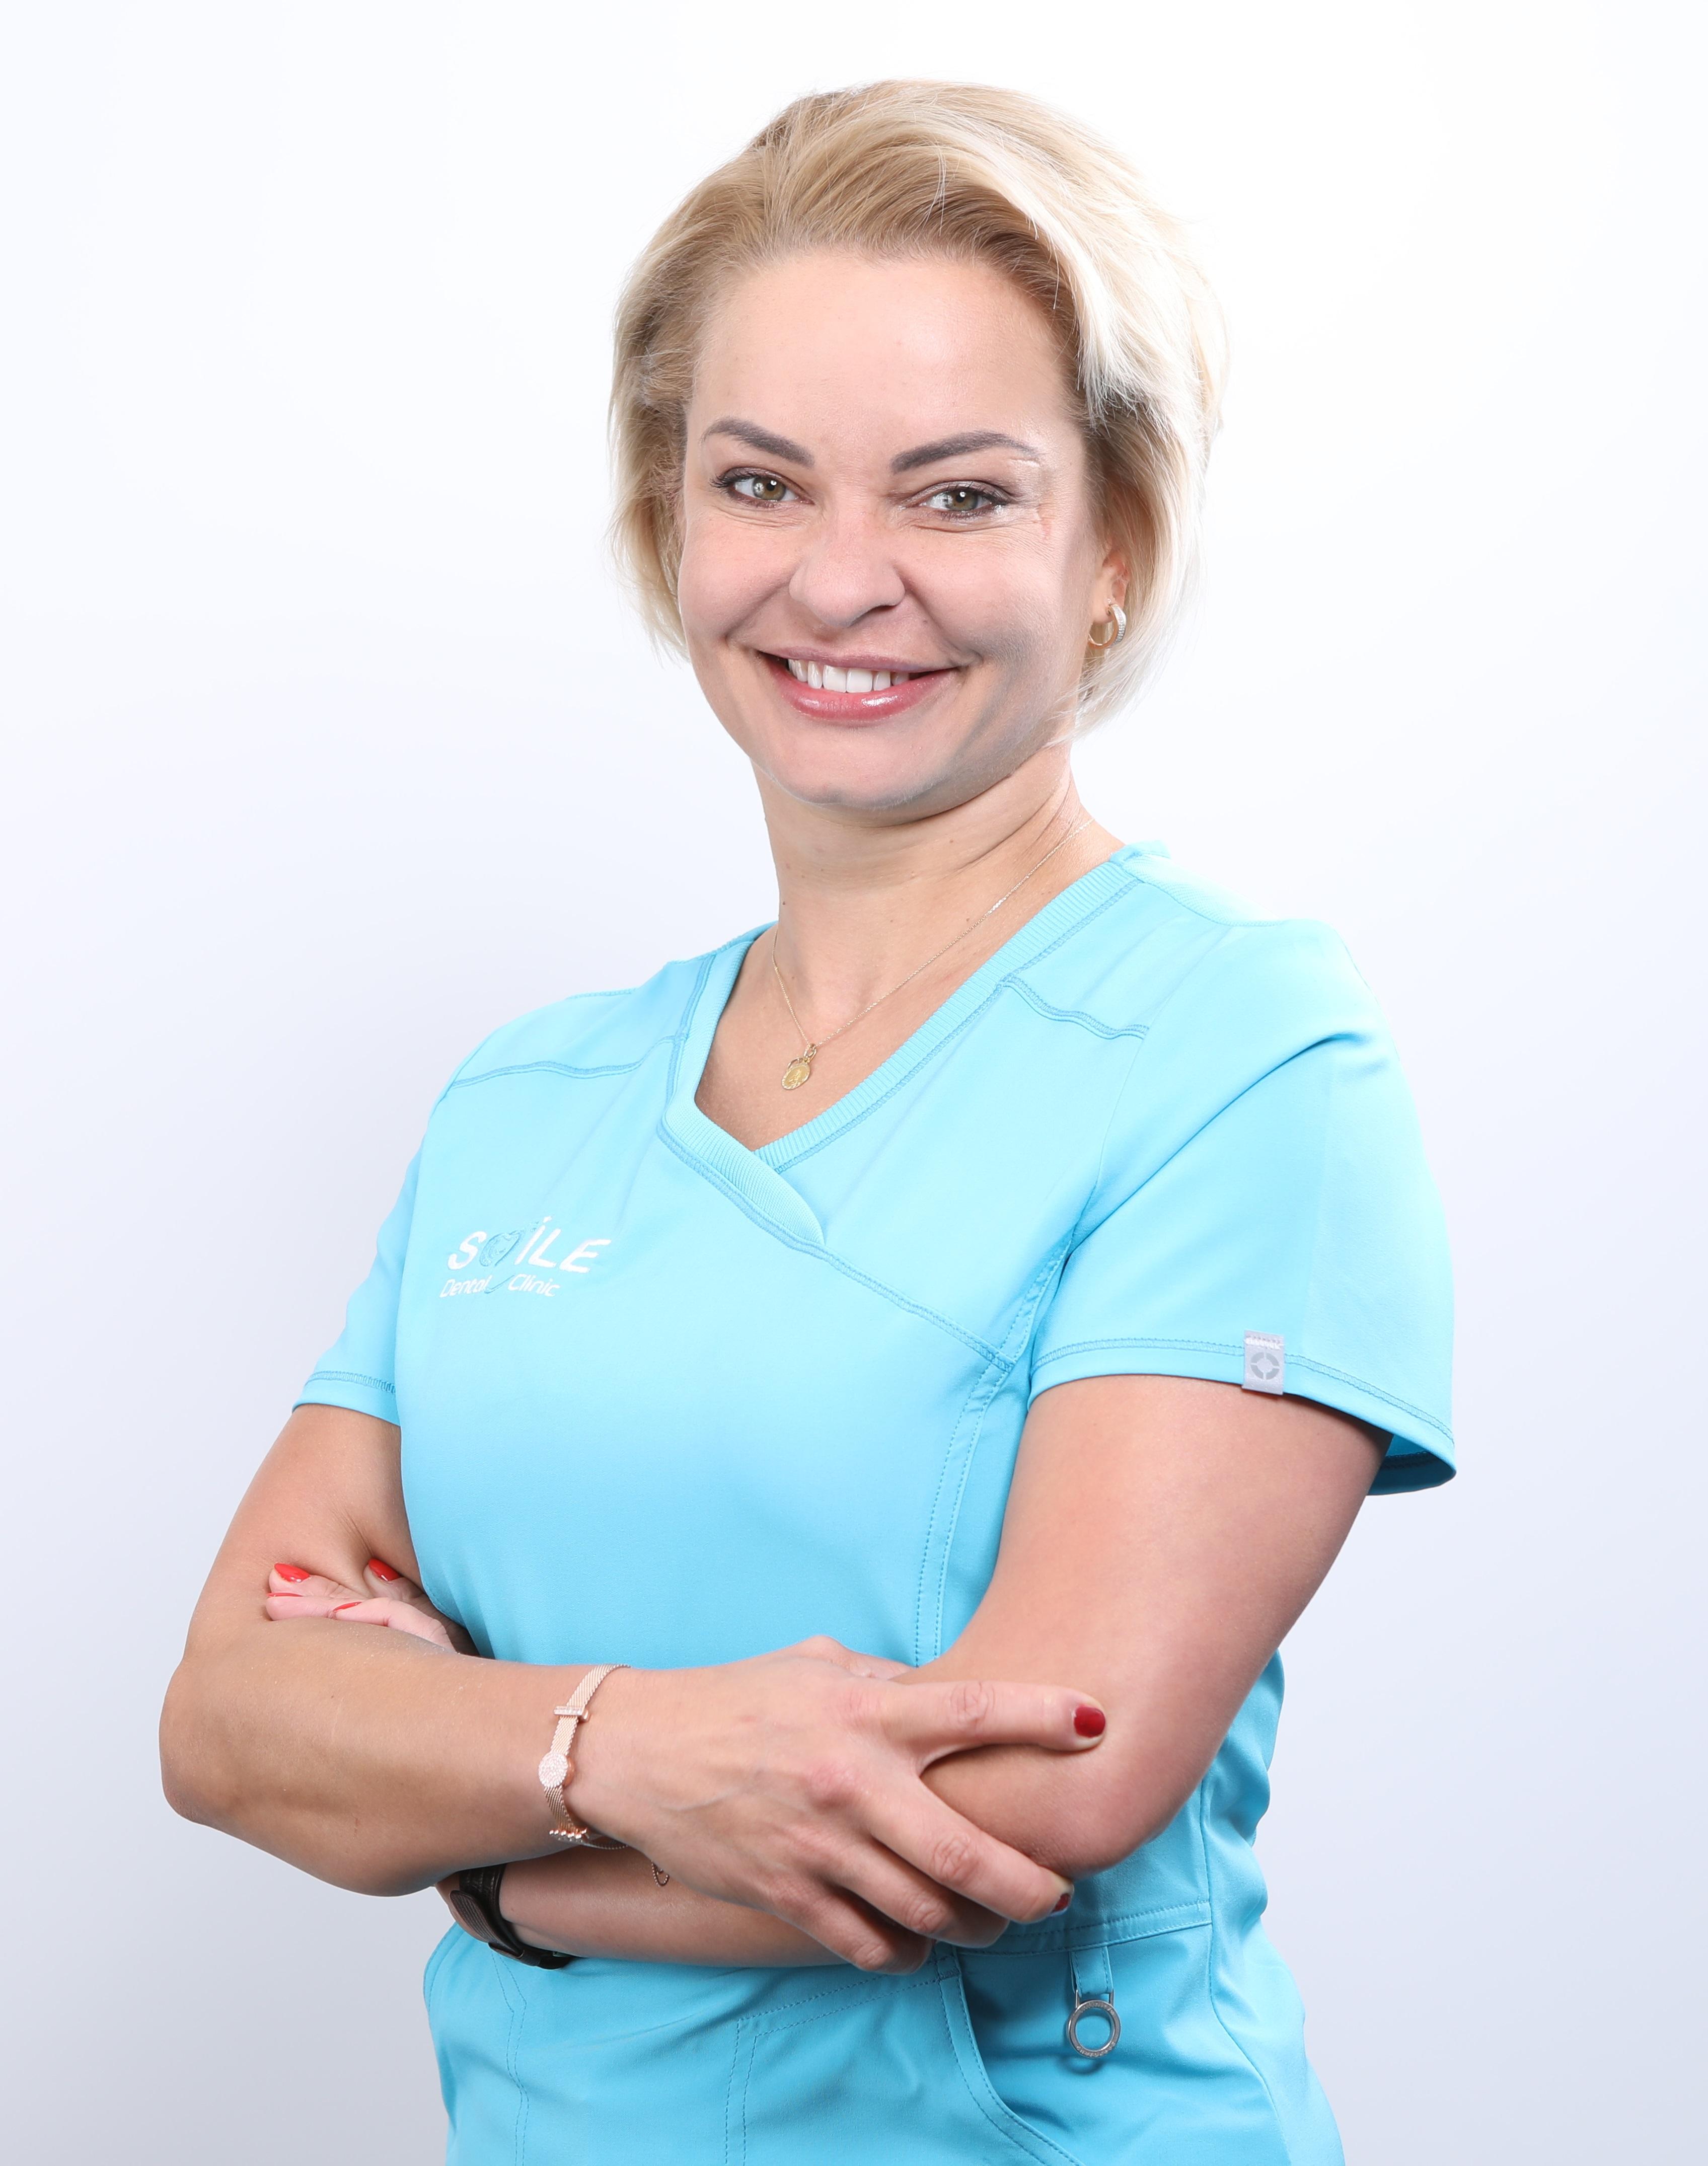 dr n. med. Katarzyna Wawrzyn